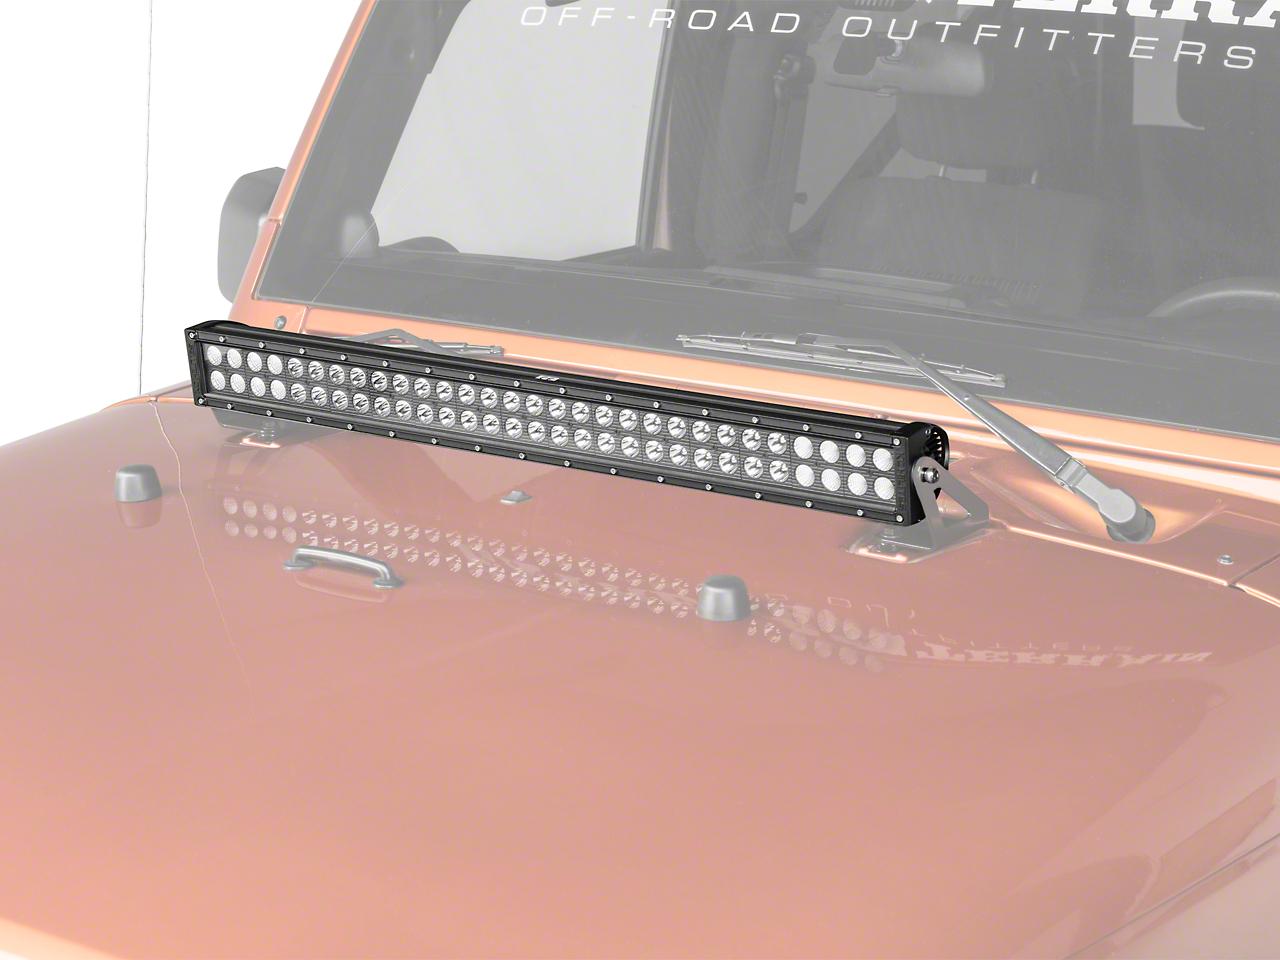 KC HiLiTES 30 in. C-Series C30 LED Light Bar - Spot/Spread Combo (87-17 Wrangler YJ, TJ & JK)